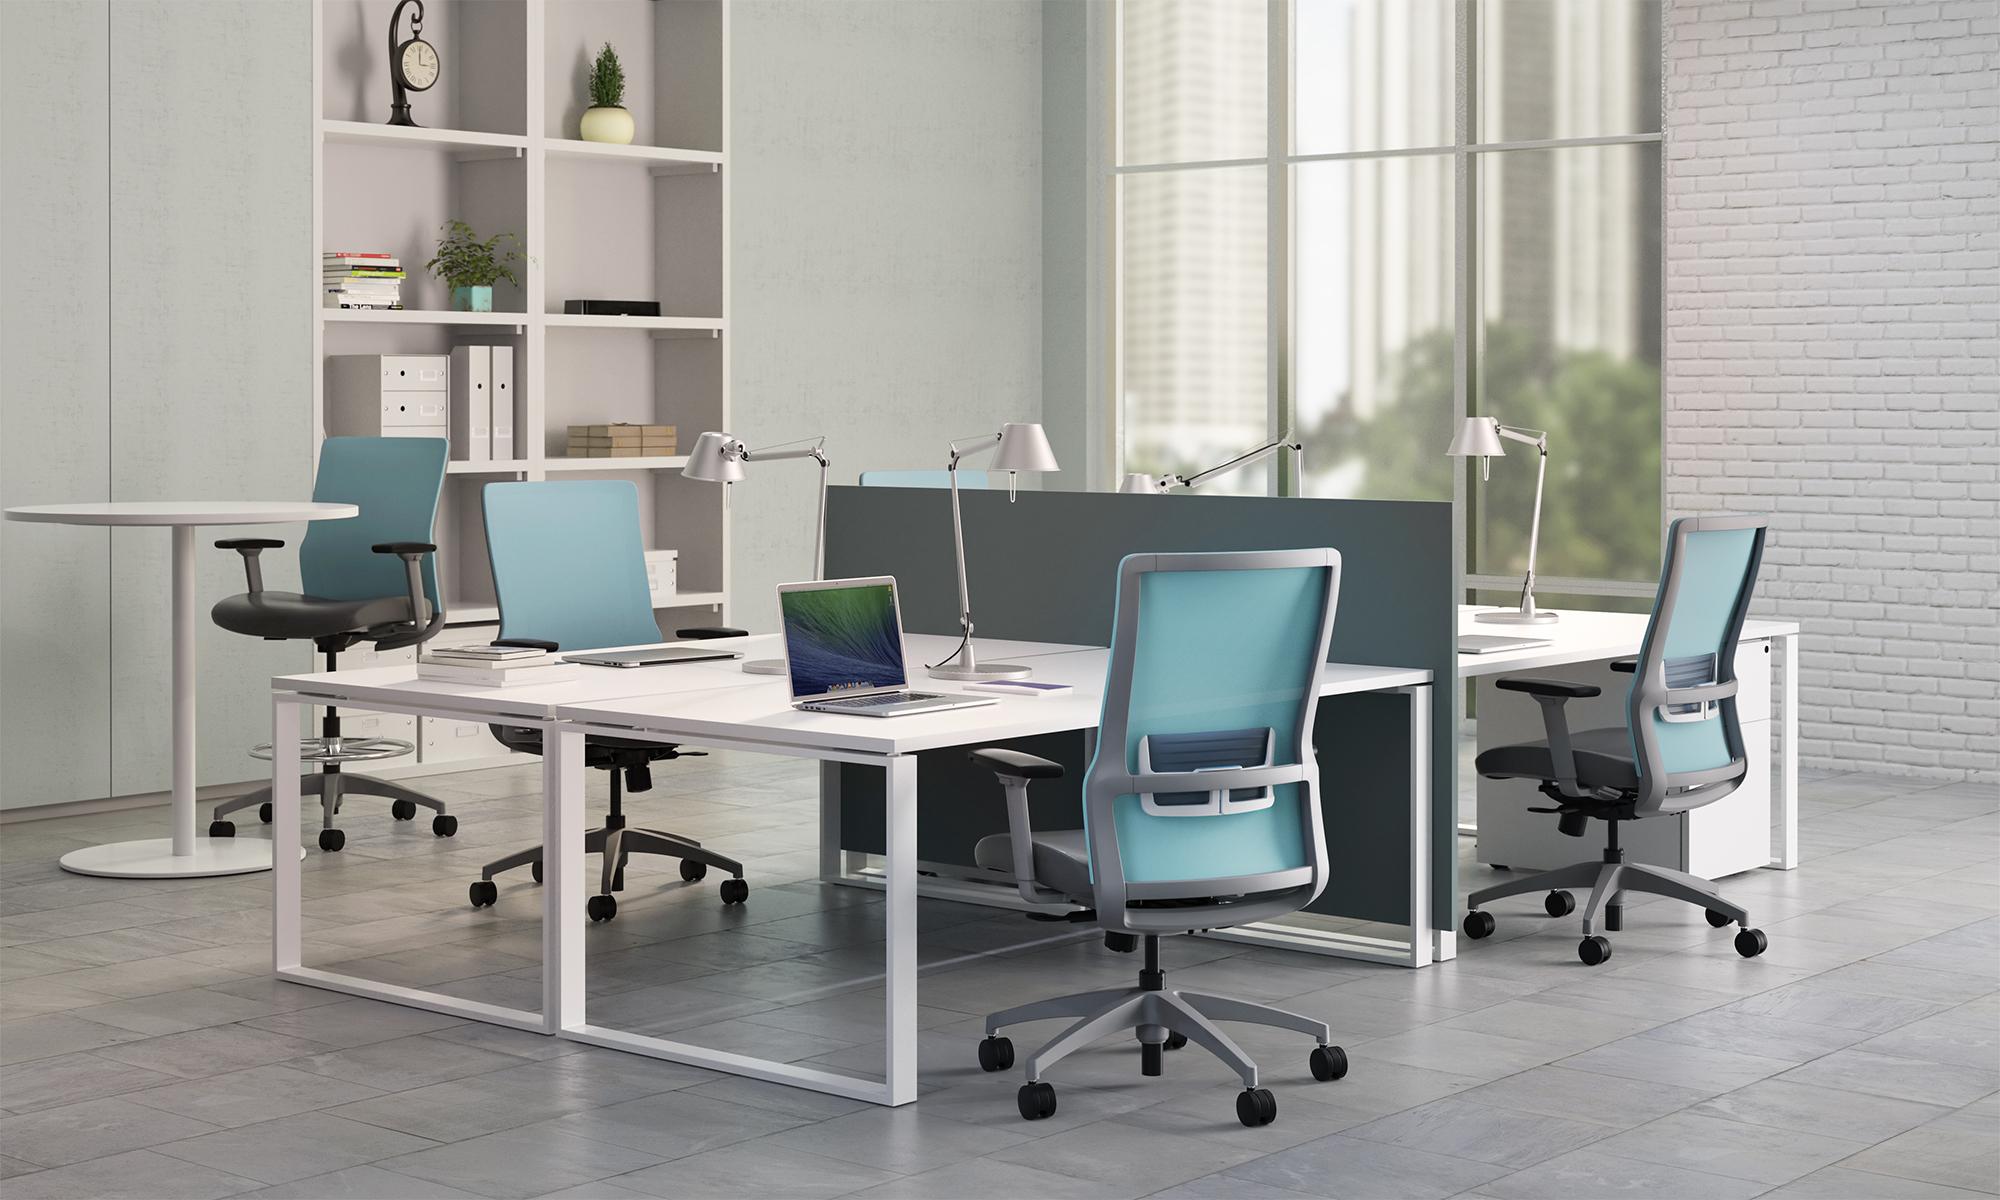 novo_office_environment.jpg